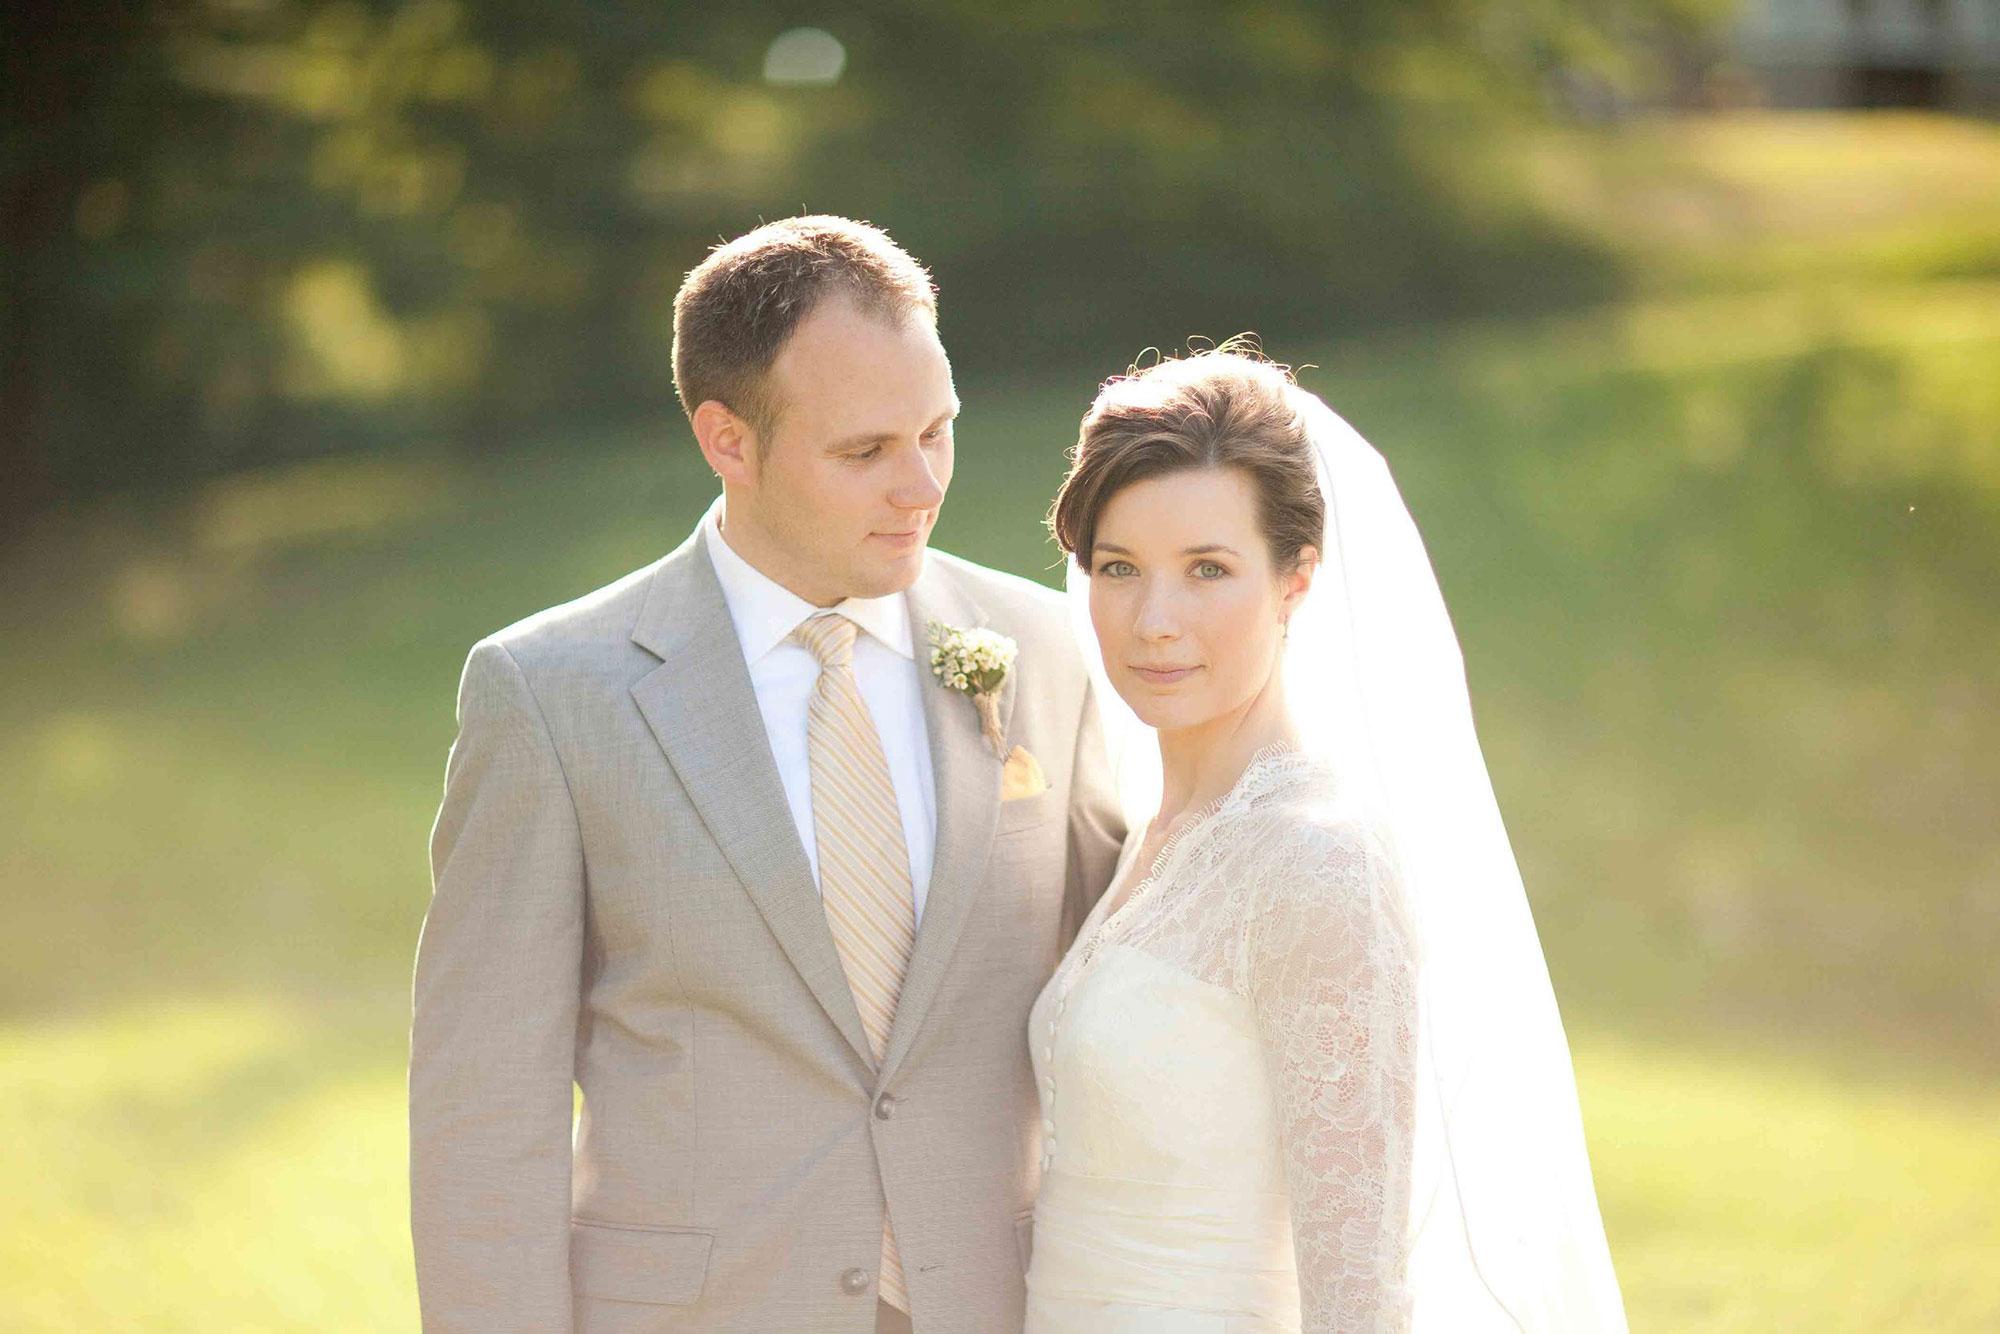 Amanda-Cowley-Willowbank-Vineyard-Bride-Photo-By-White-Photographie-034.jpg